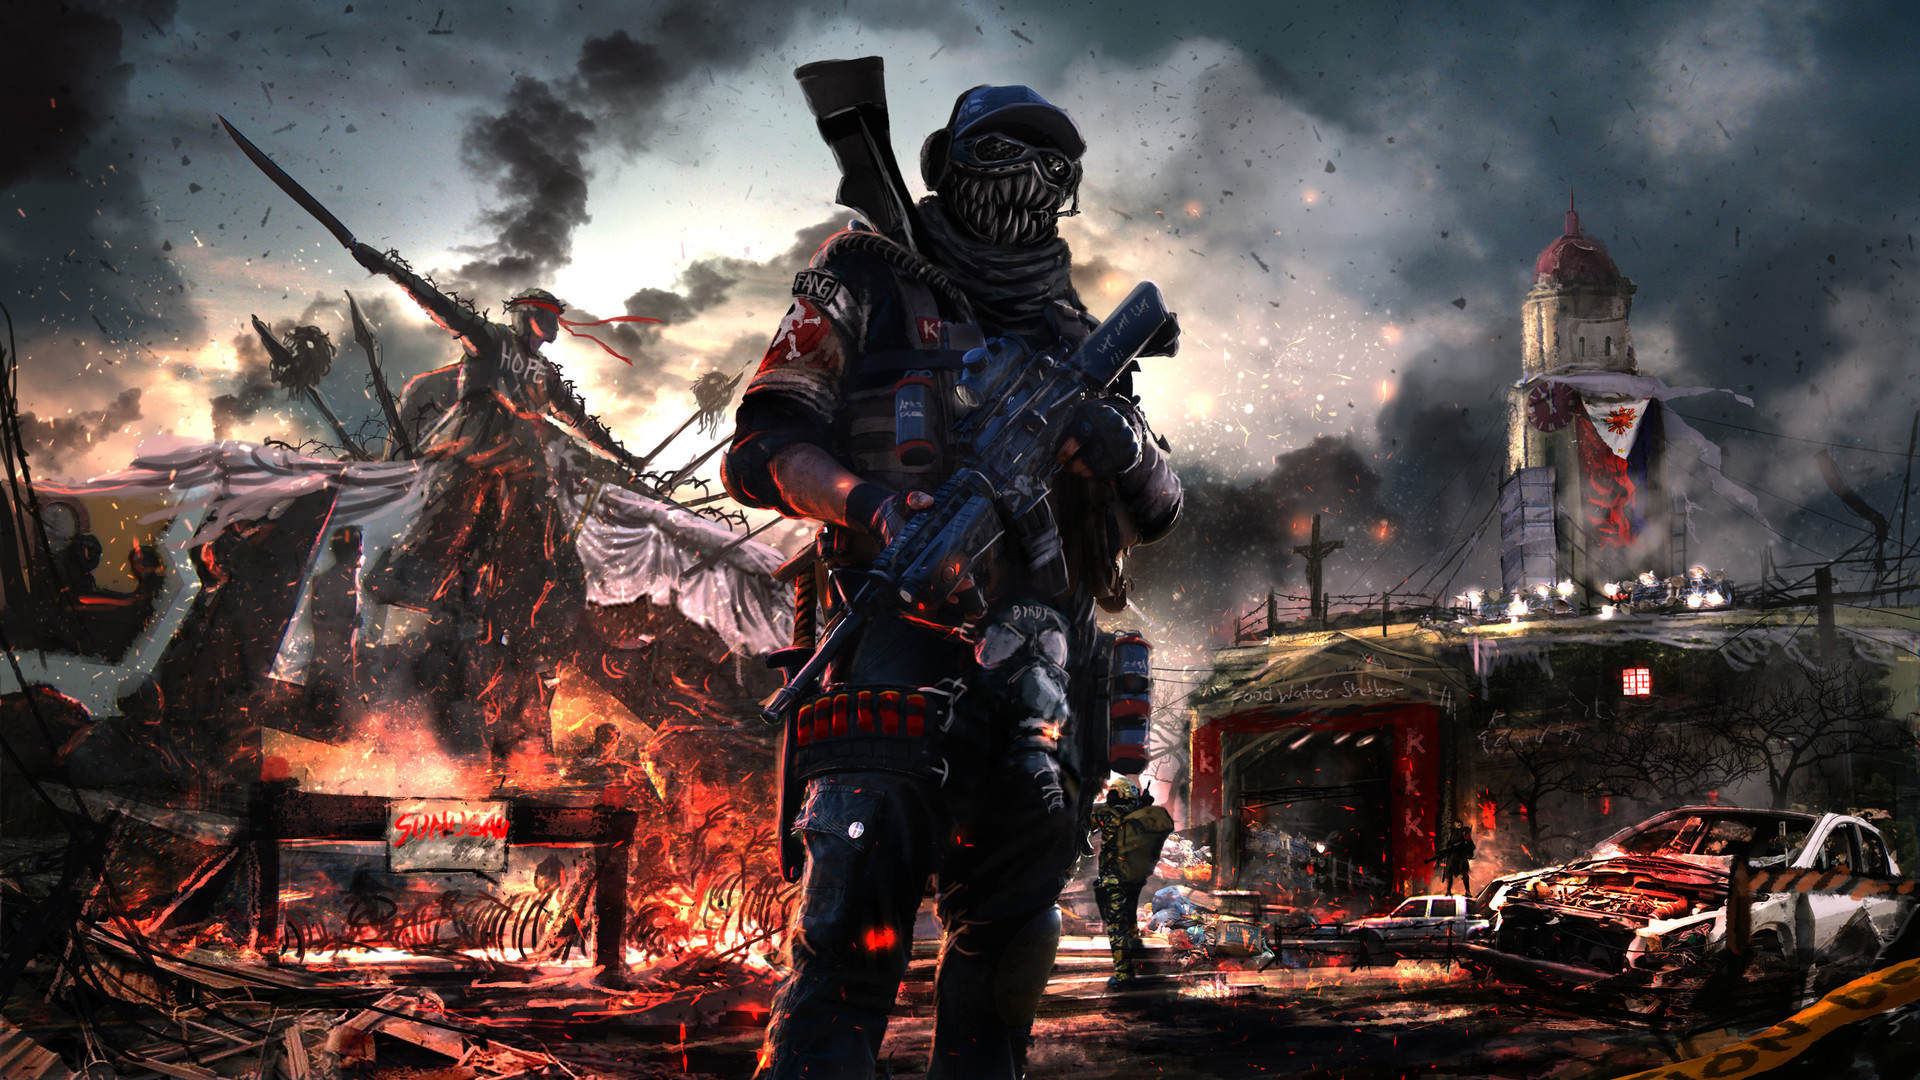 Post Apocalyptic Soldier Artwork